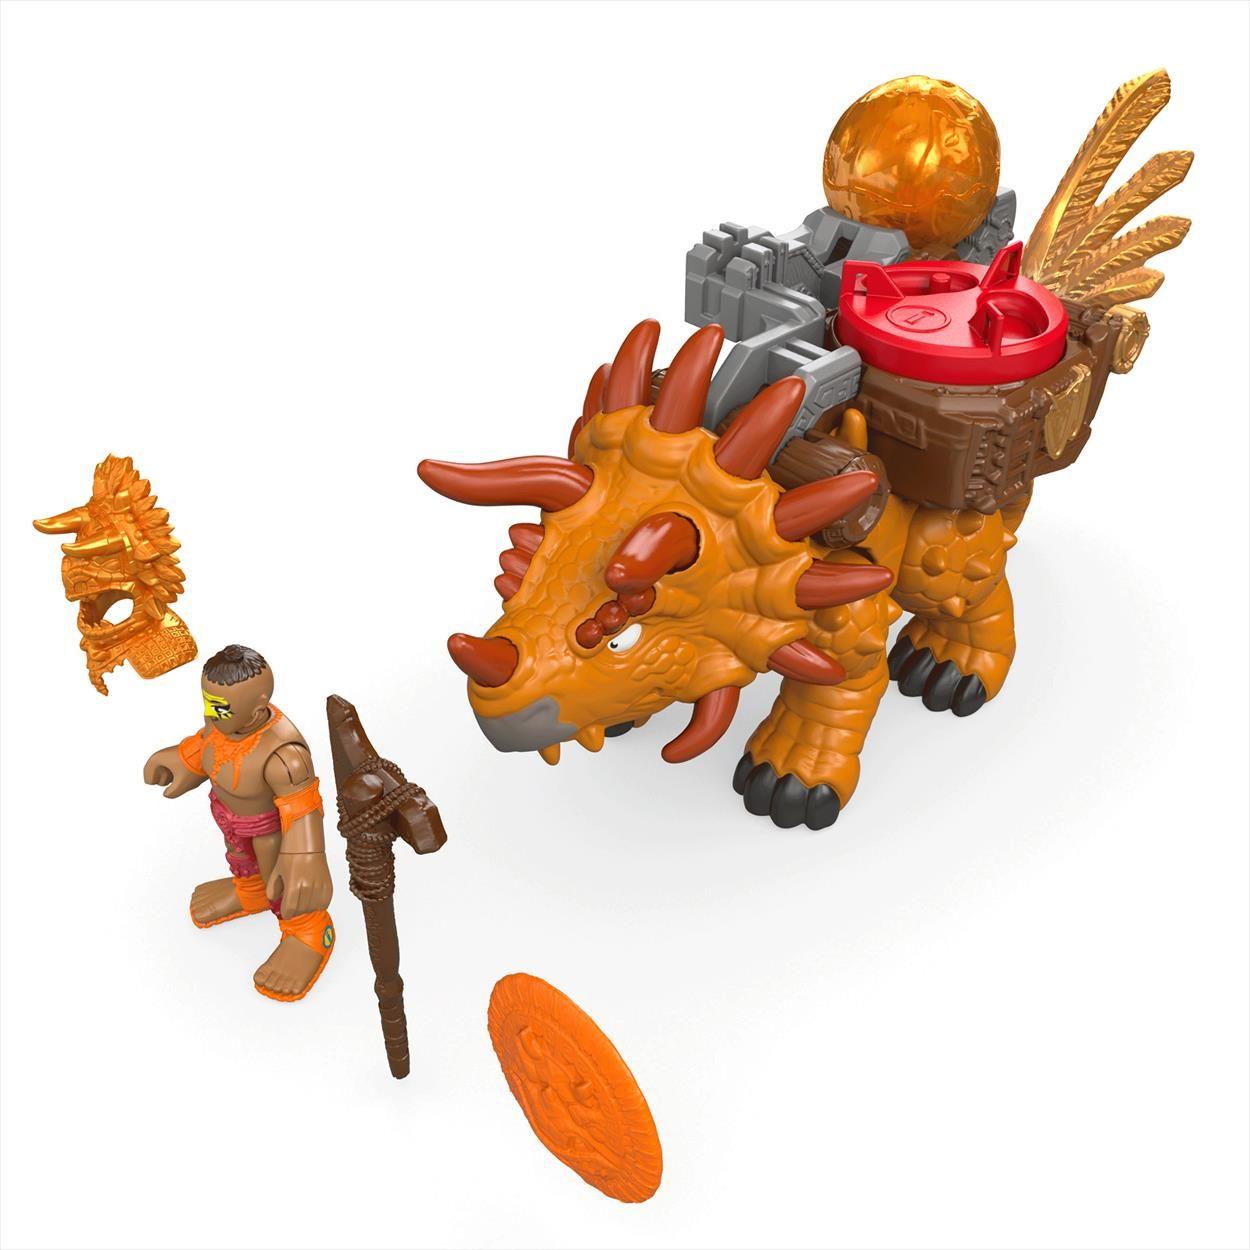 Cdw80 triceratops kids toys cool toys vintage toys